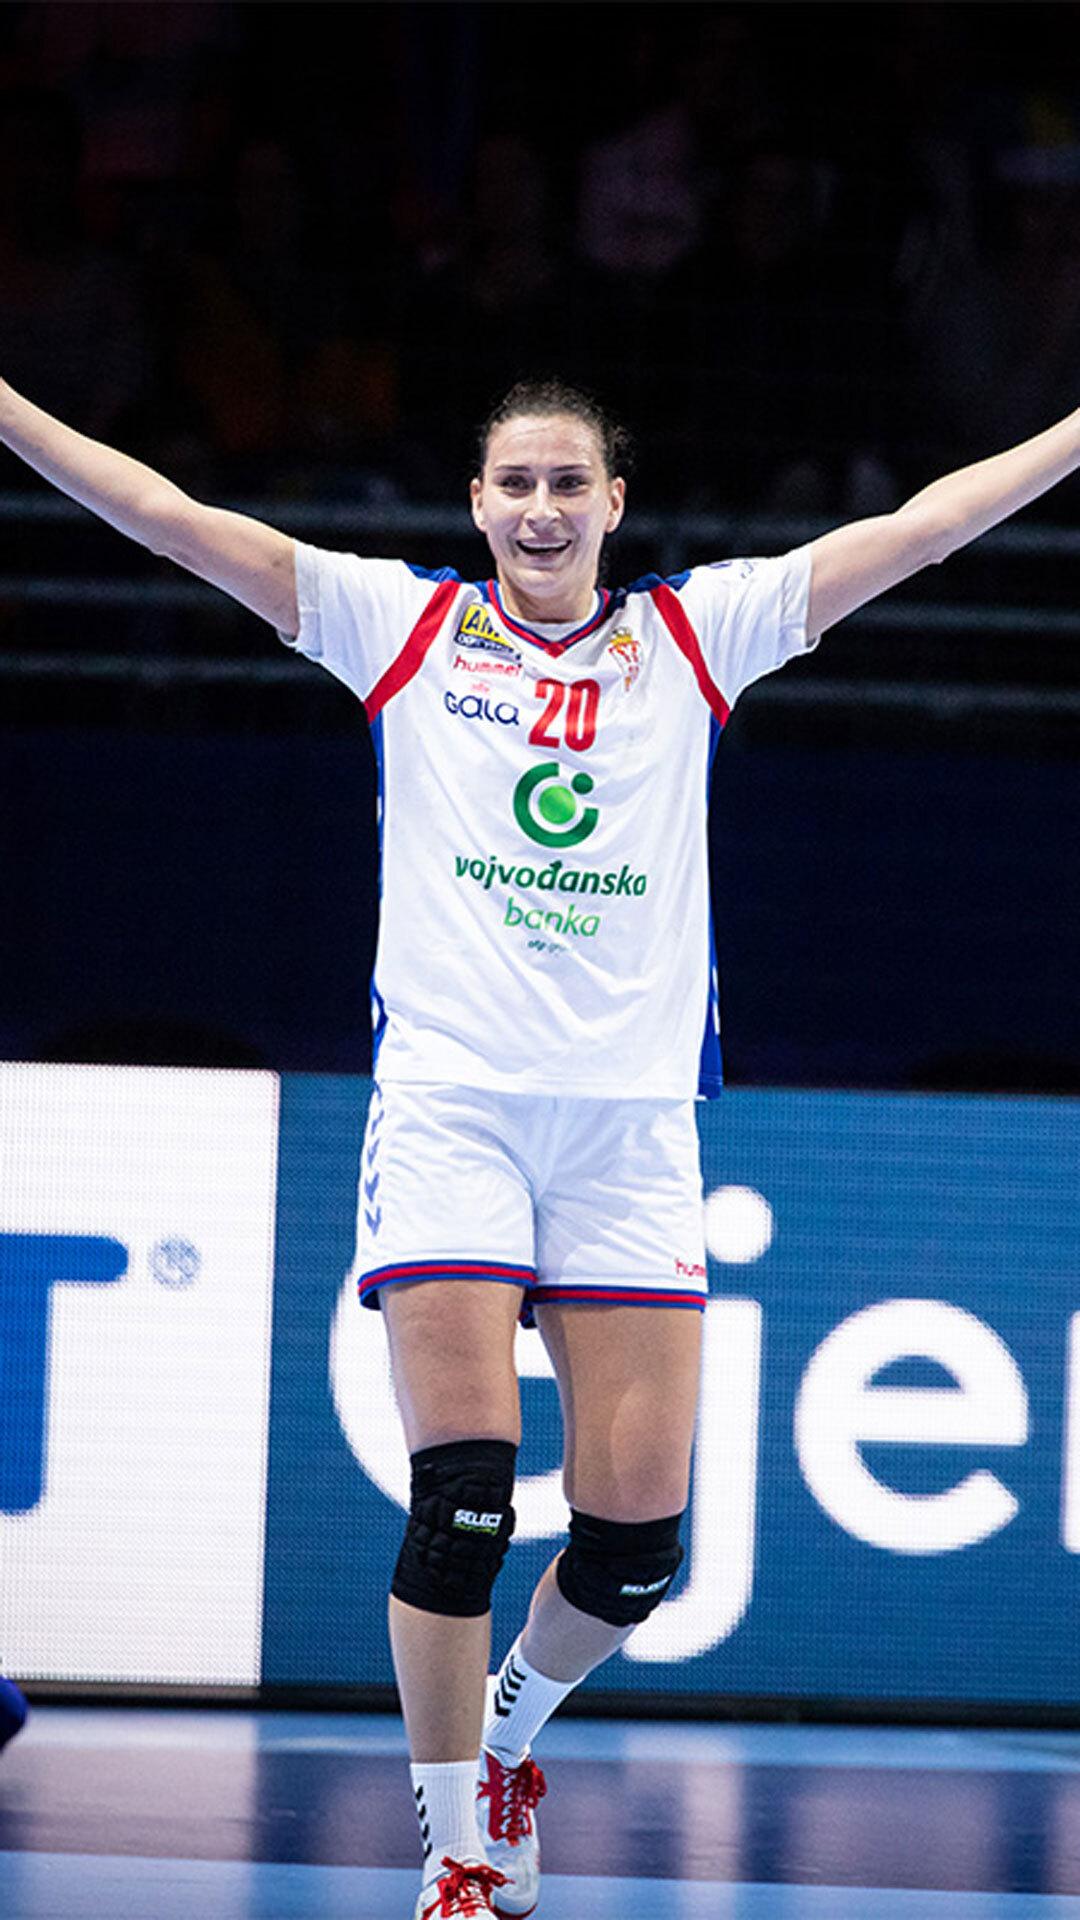 Sladjana-Po-Lazic_(c)EHF_Anze-Malovrh_kolektiff